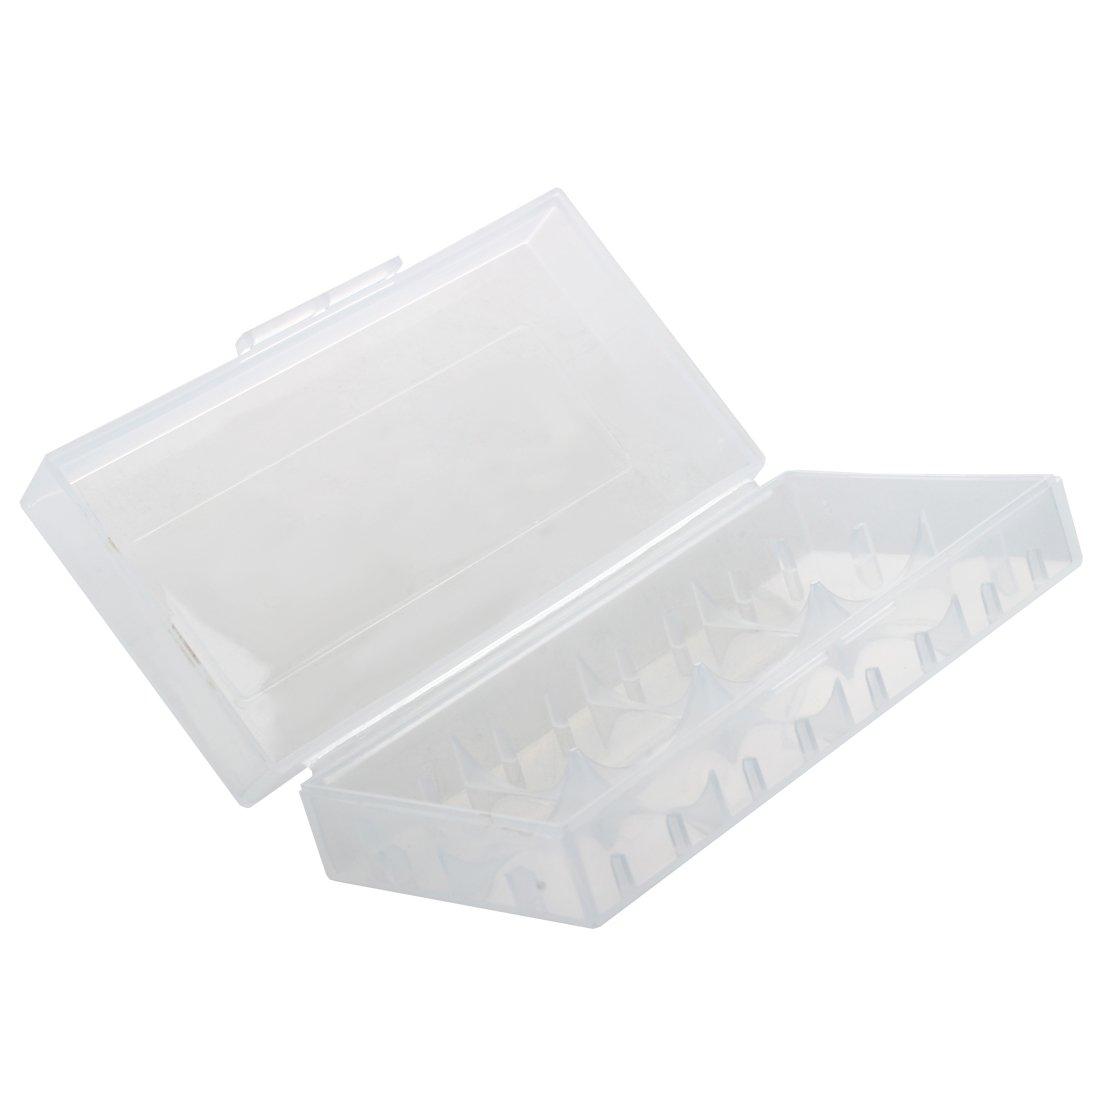 SODIAL(R) Caja para Pila Bateria 18650 Portapila Portabateria Transparente: Amazon.es: Electrónica